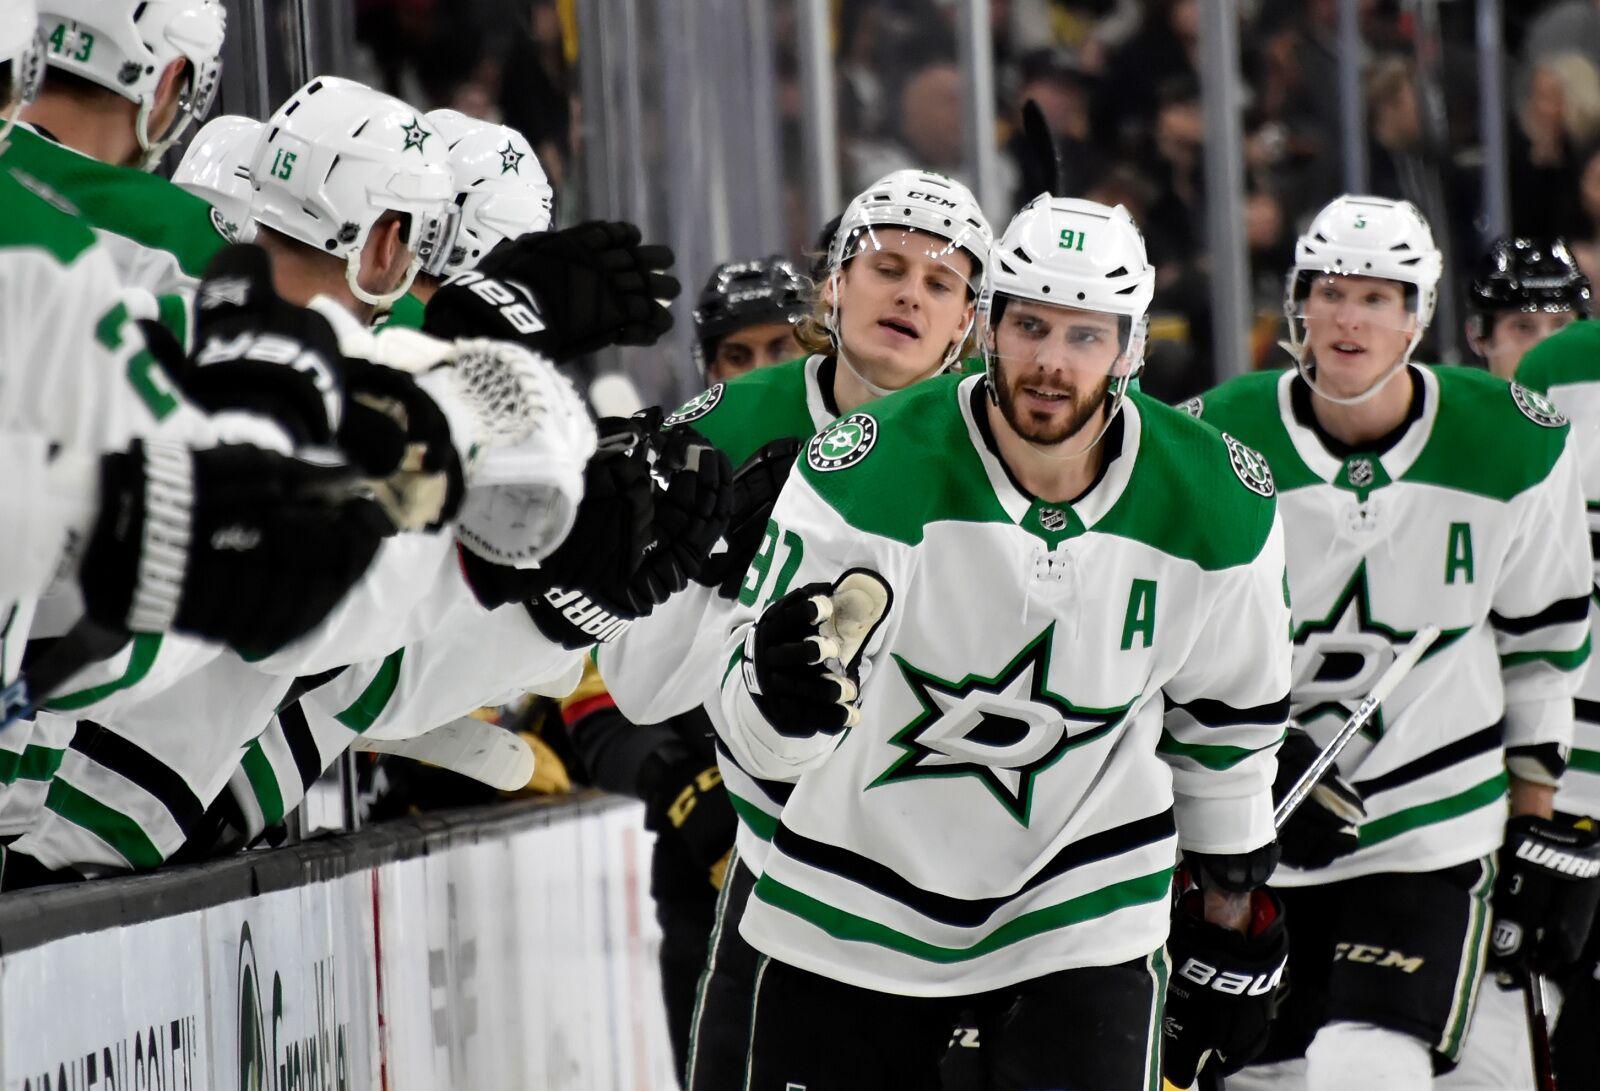 Dallas Stars: Analyzing Potential Forward Lines For 2019-20 Season